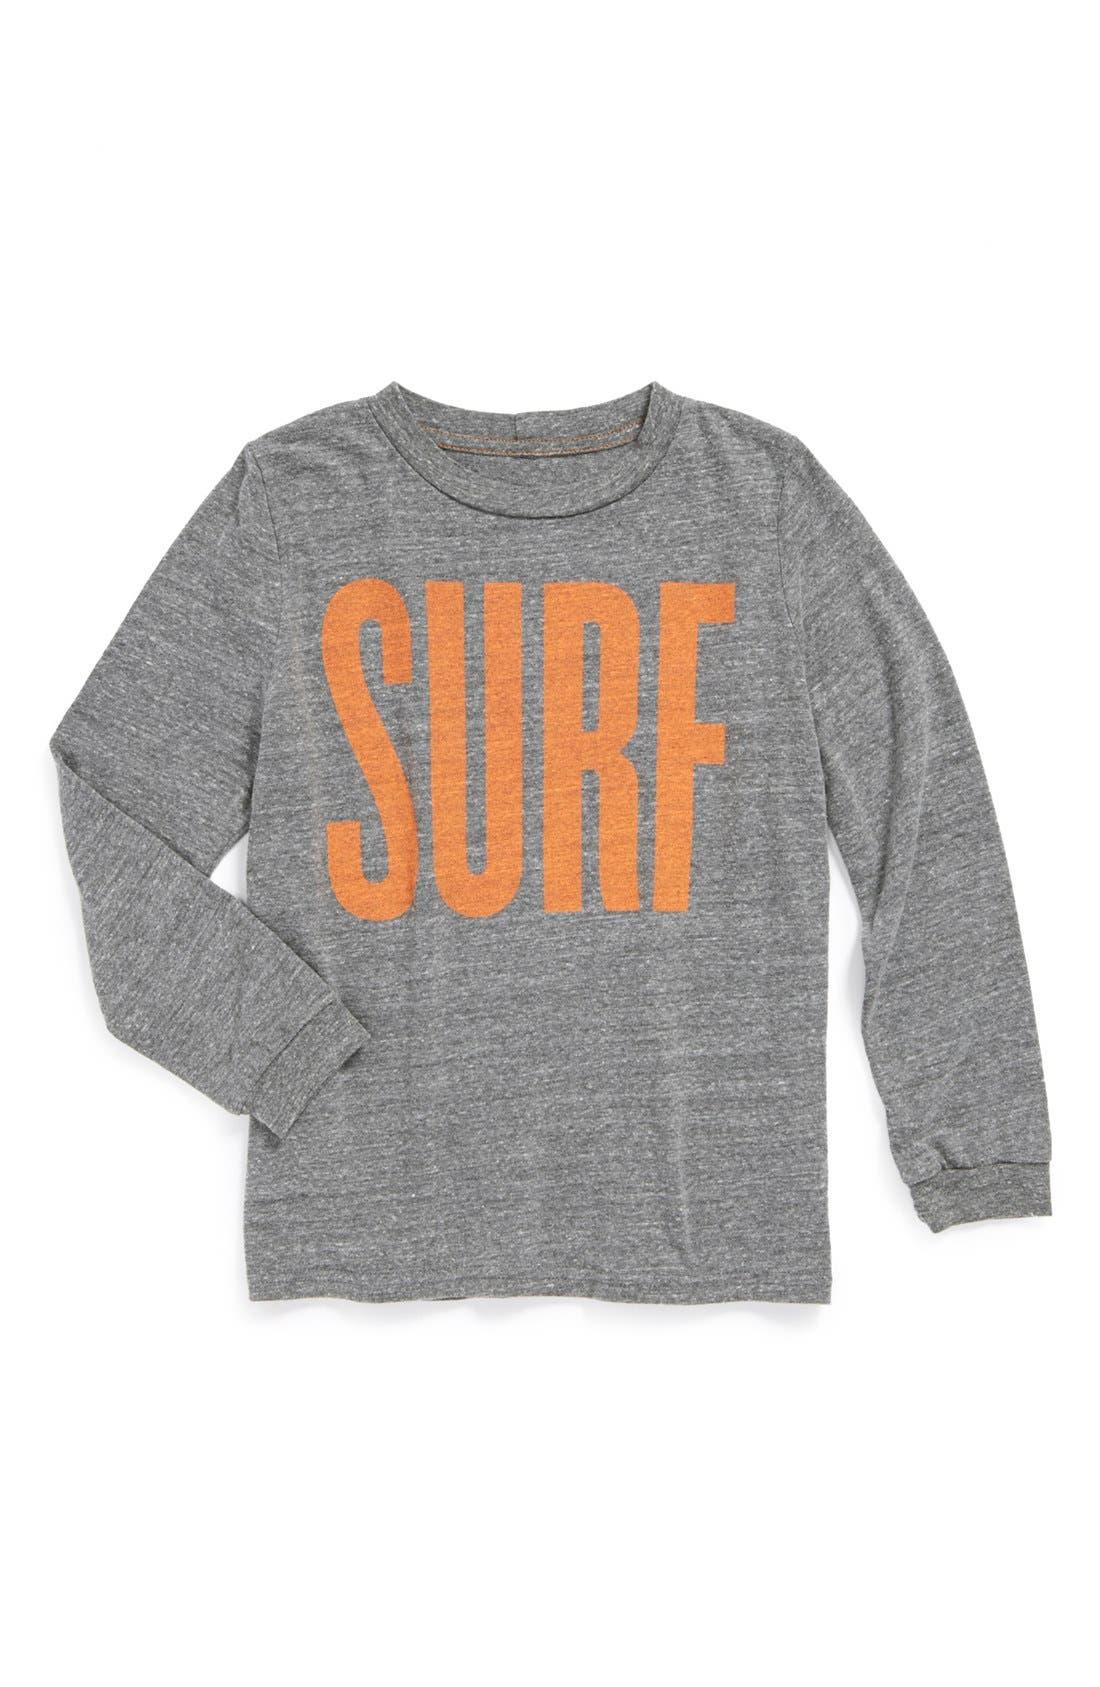 Main Image - Peek 'Surf' T-Shirt (Big Boys)